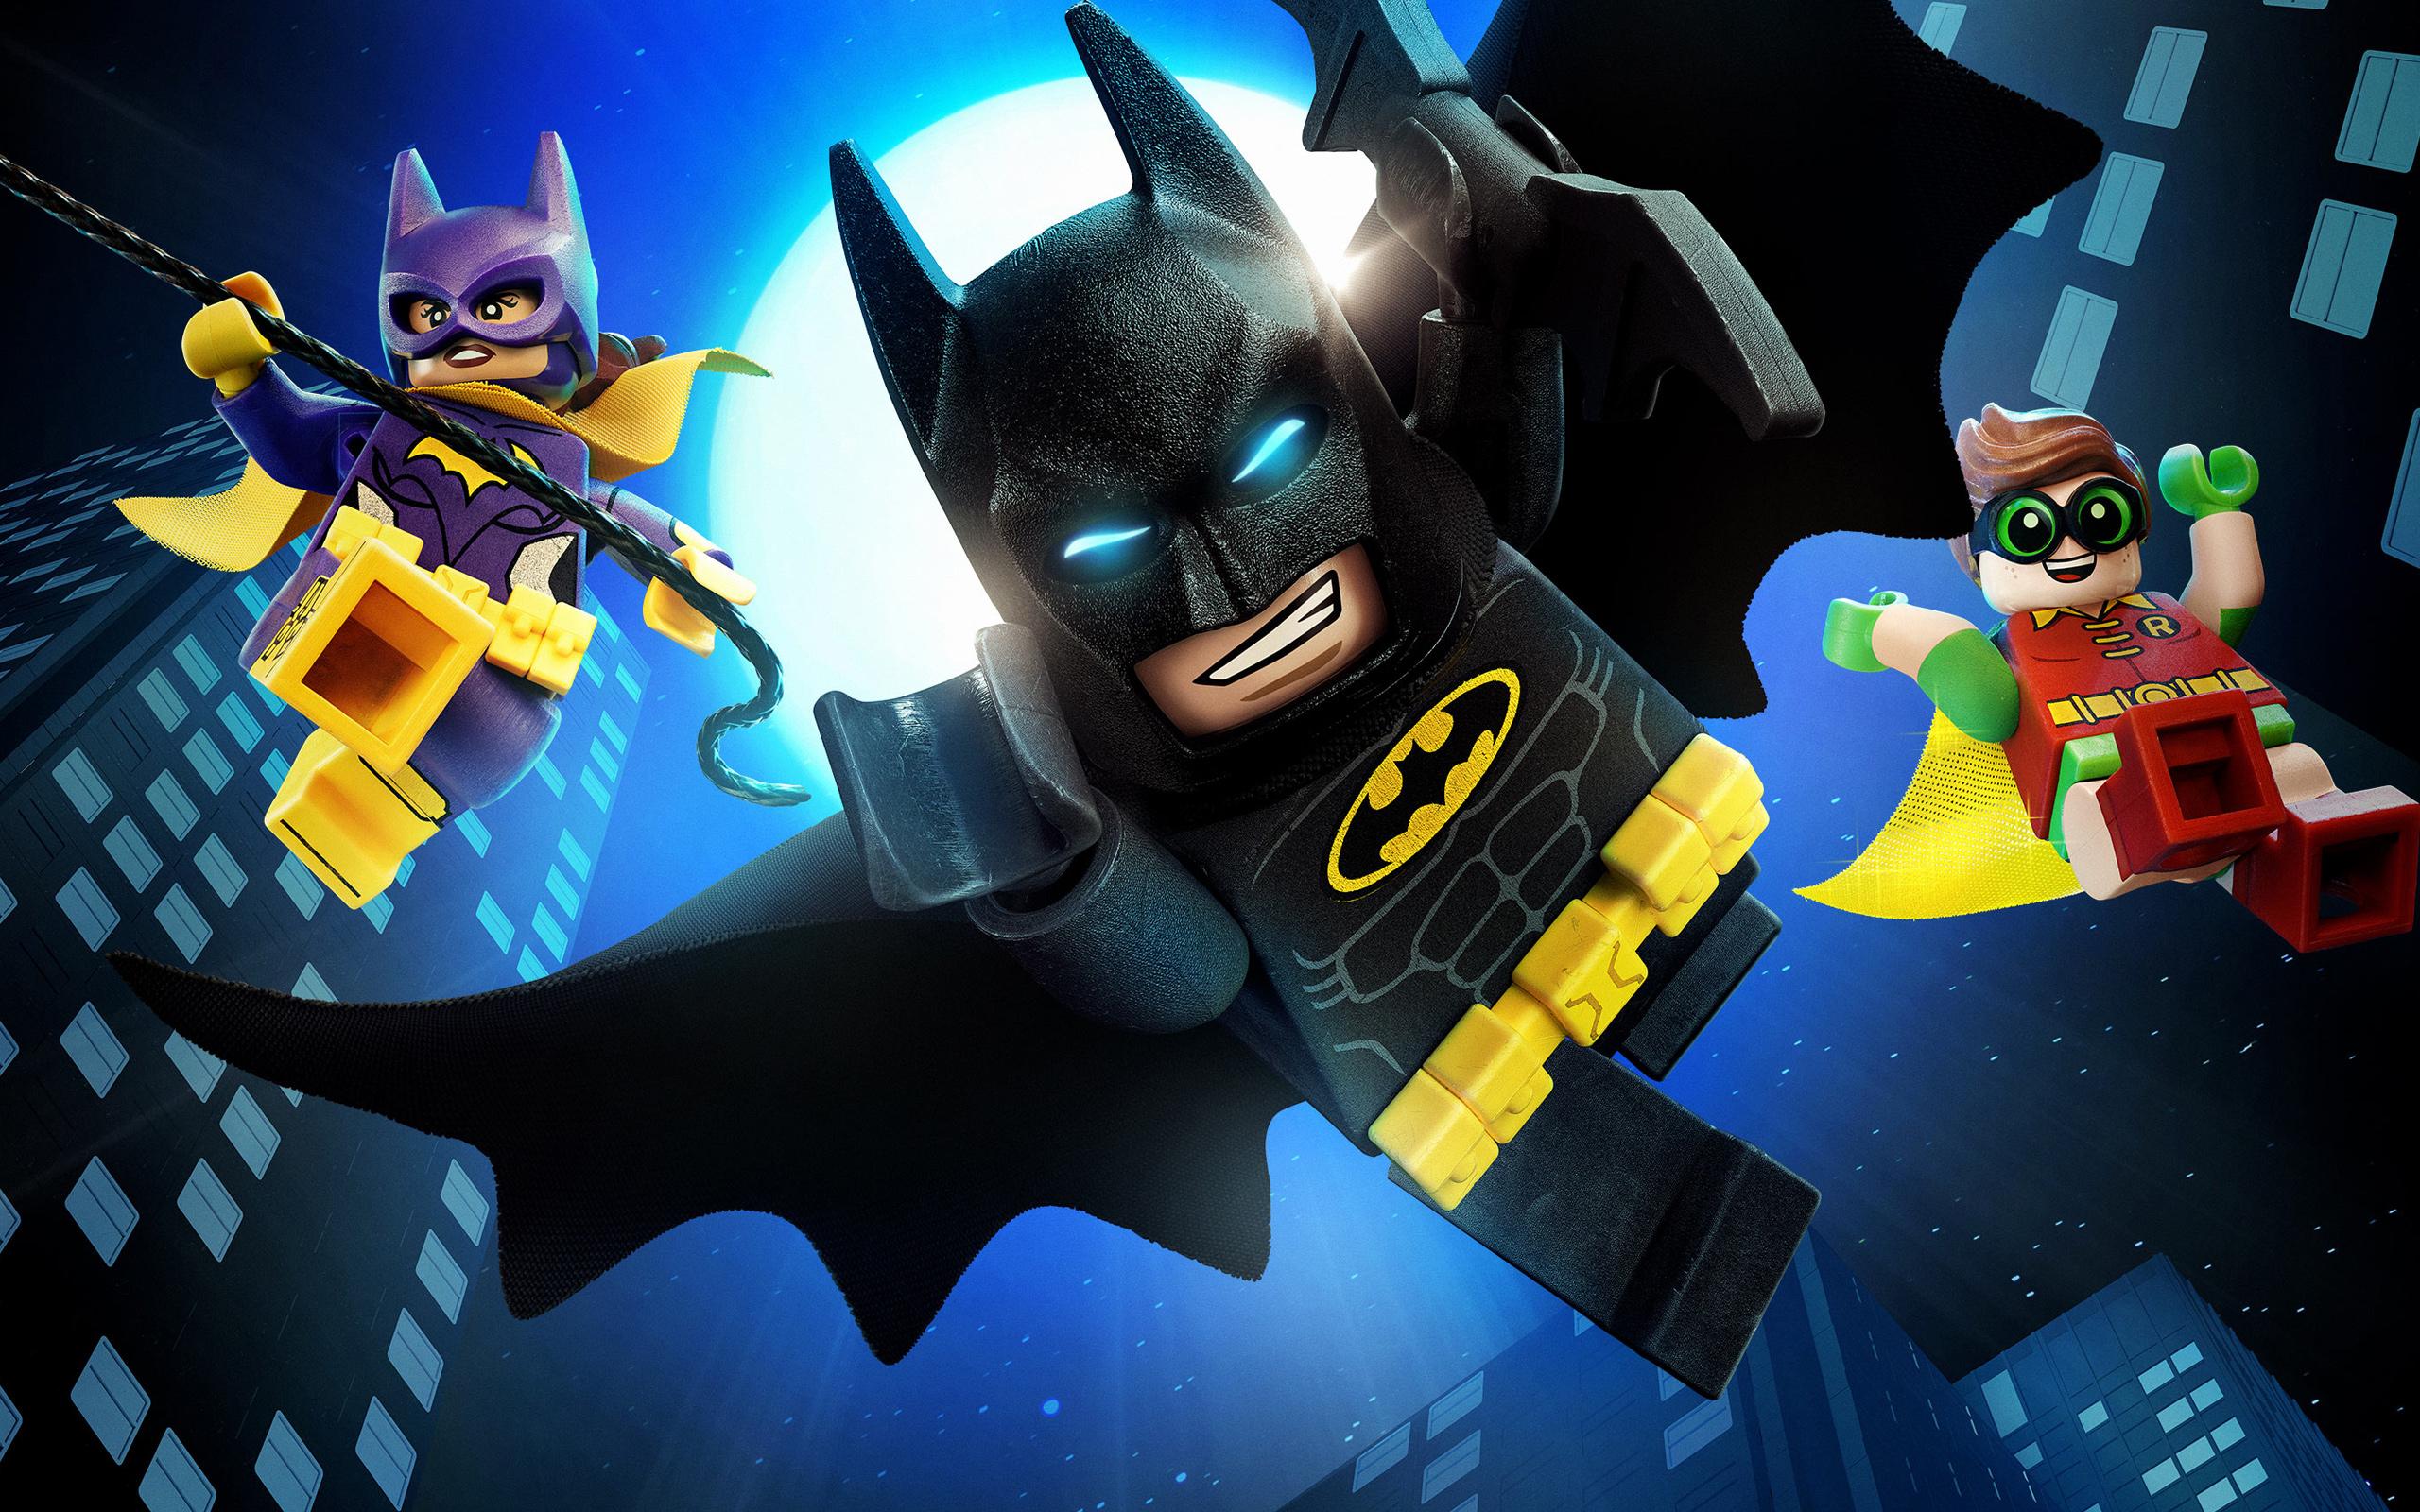 Batman 4k Wallpapers For Your Desktop Or Mobile Screen Free